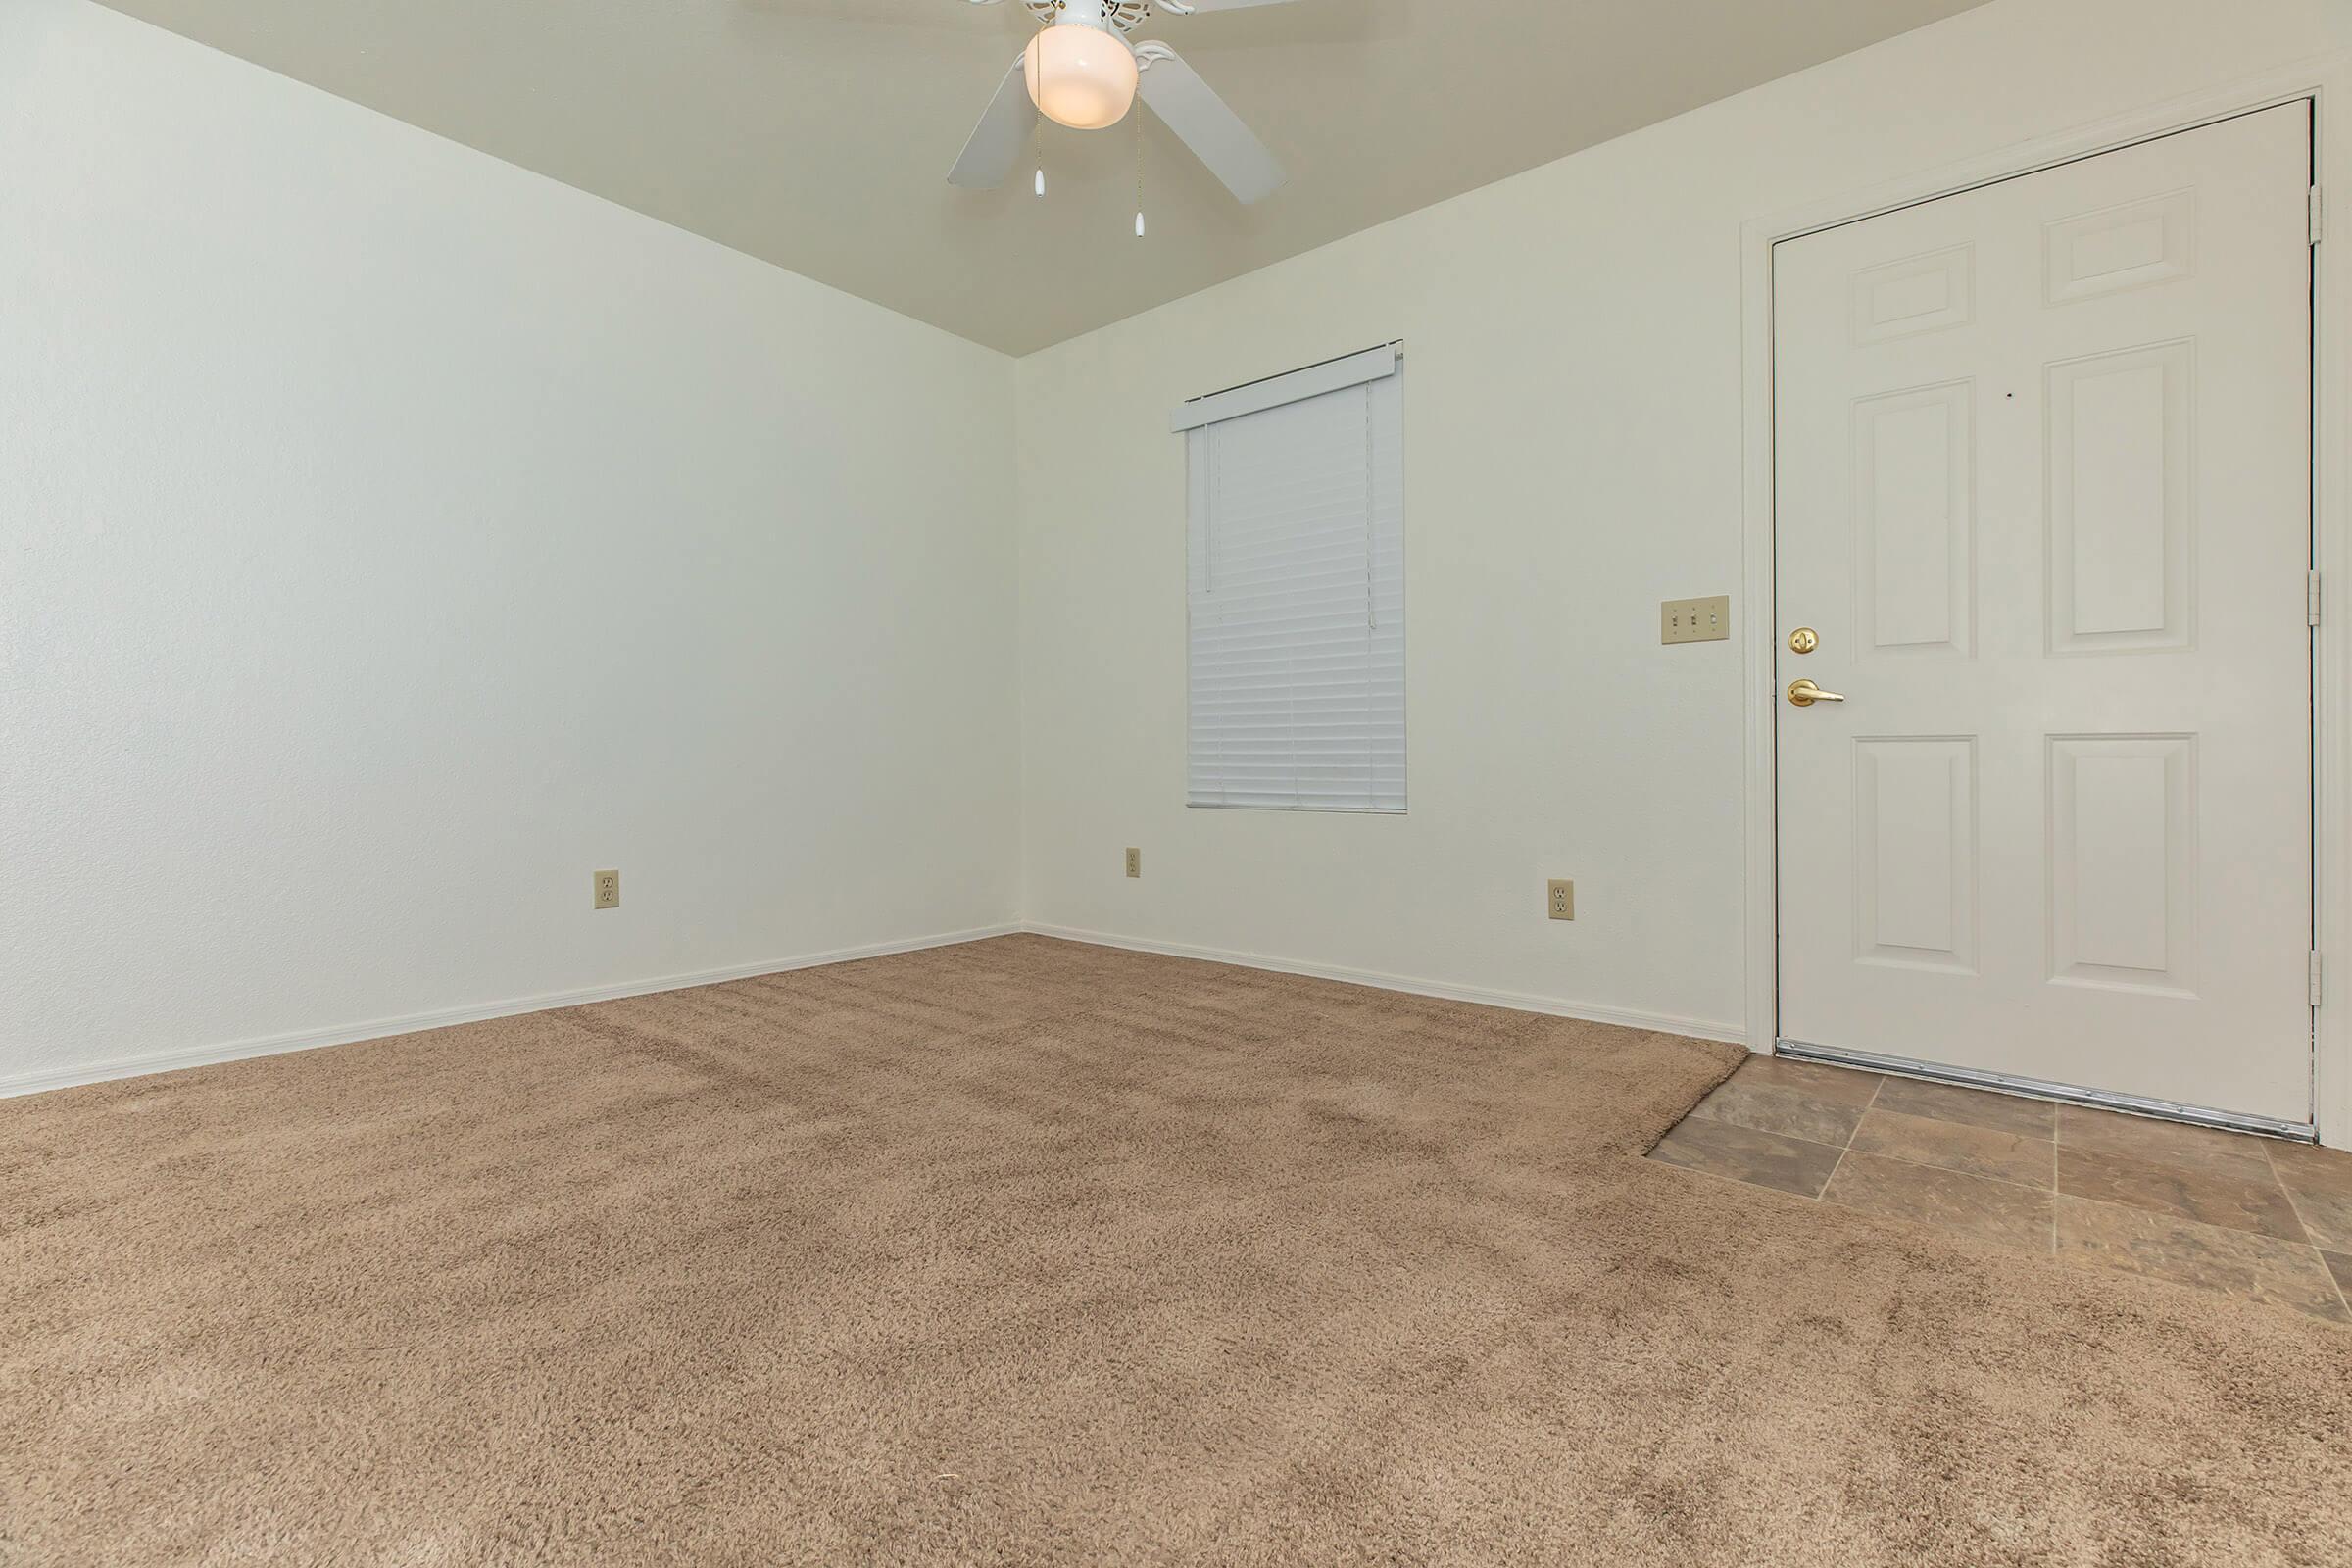 Vertical blinds - spacious floor plans